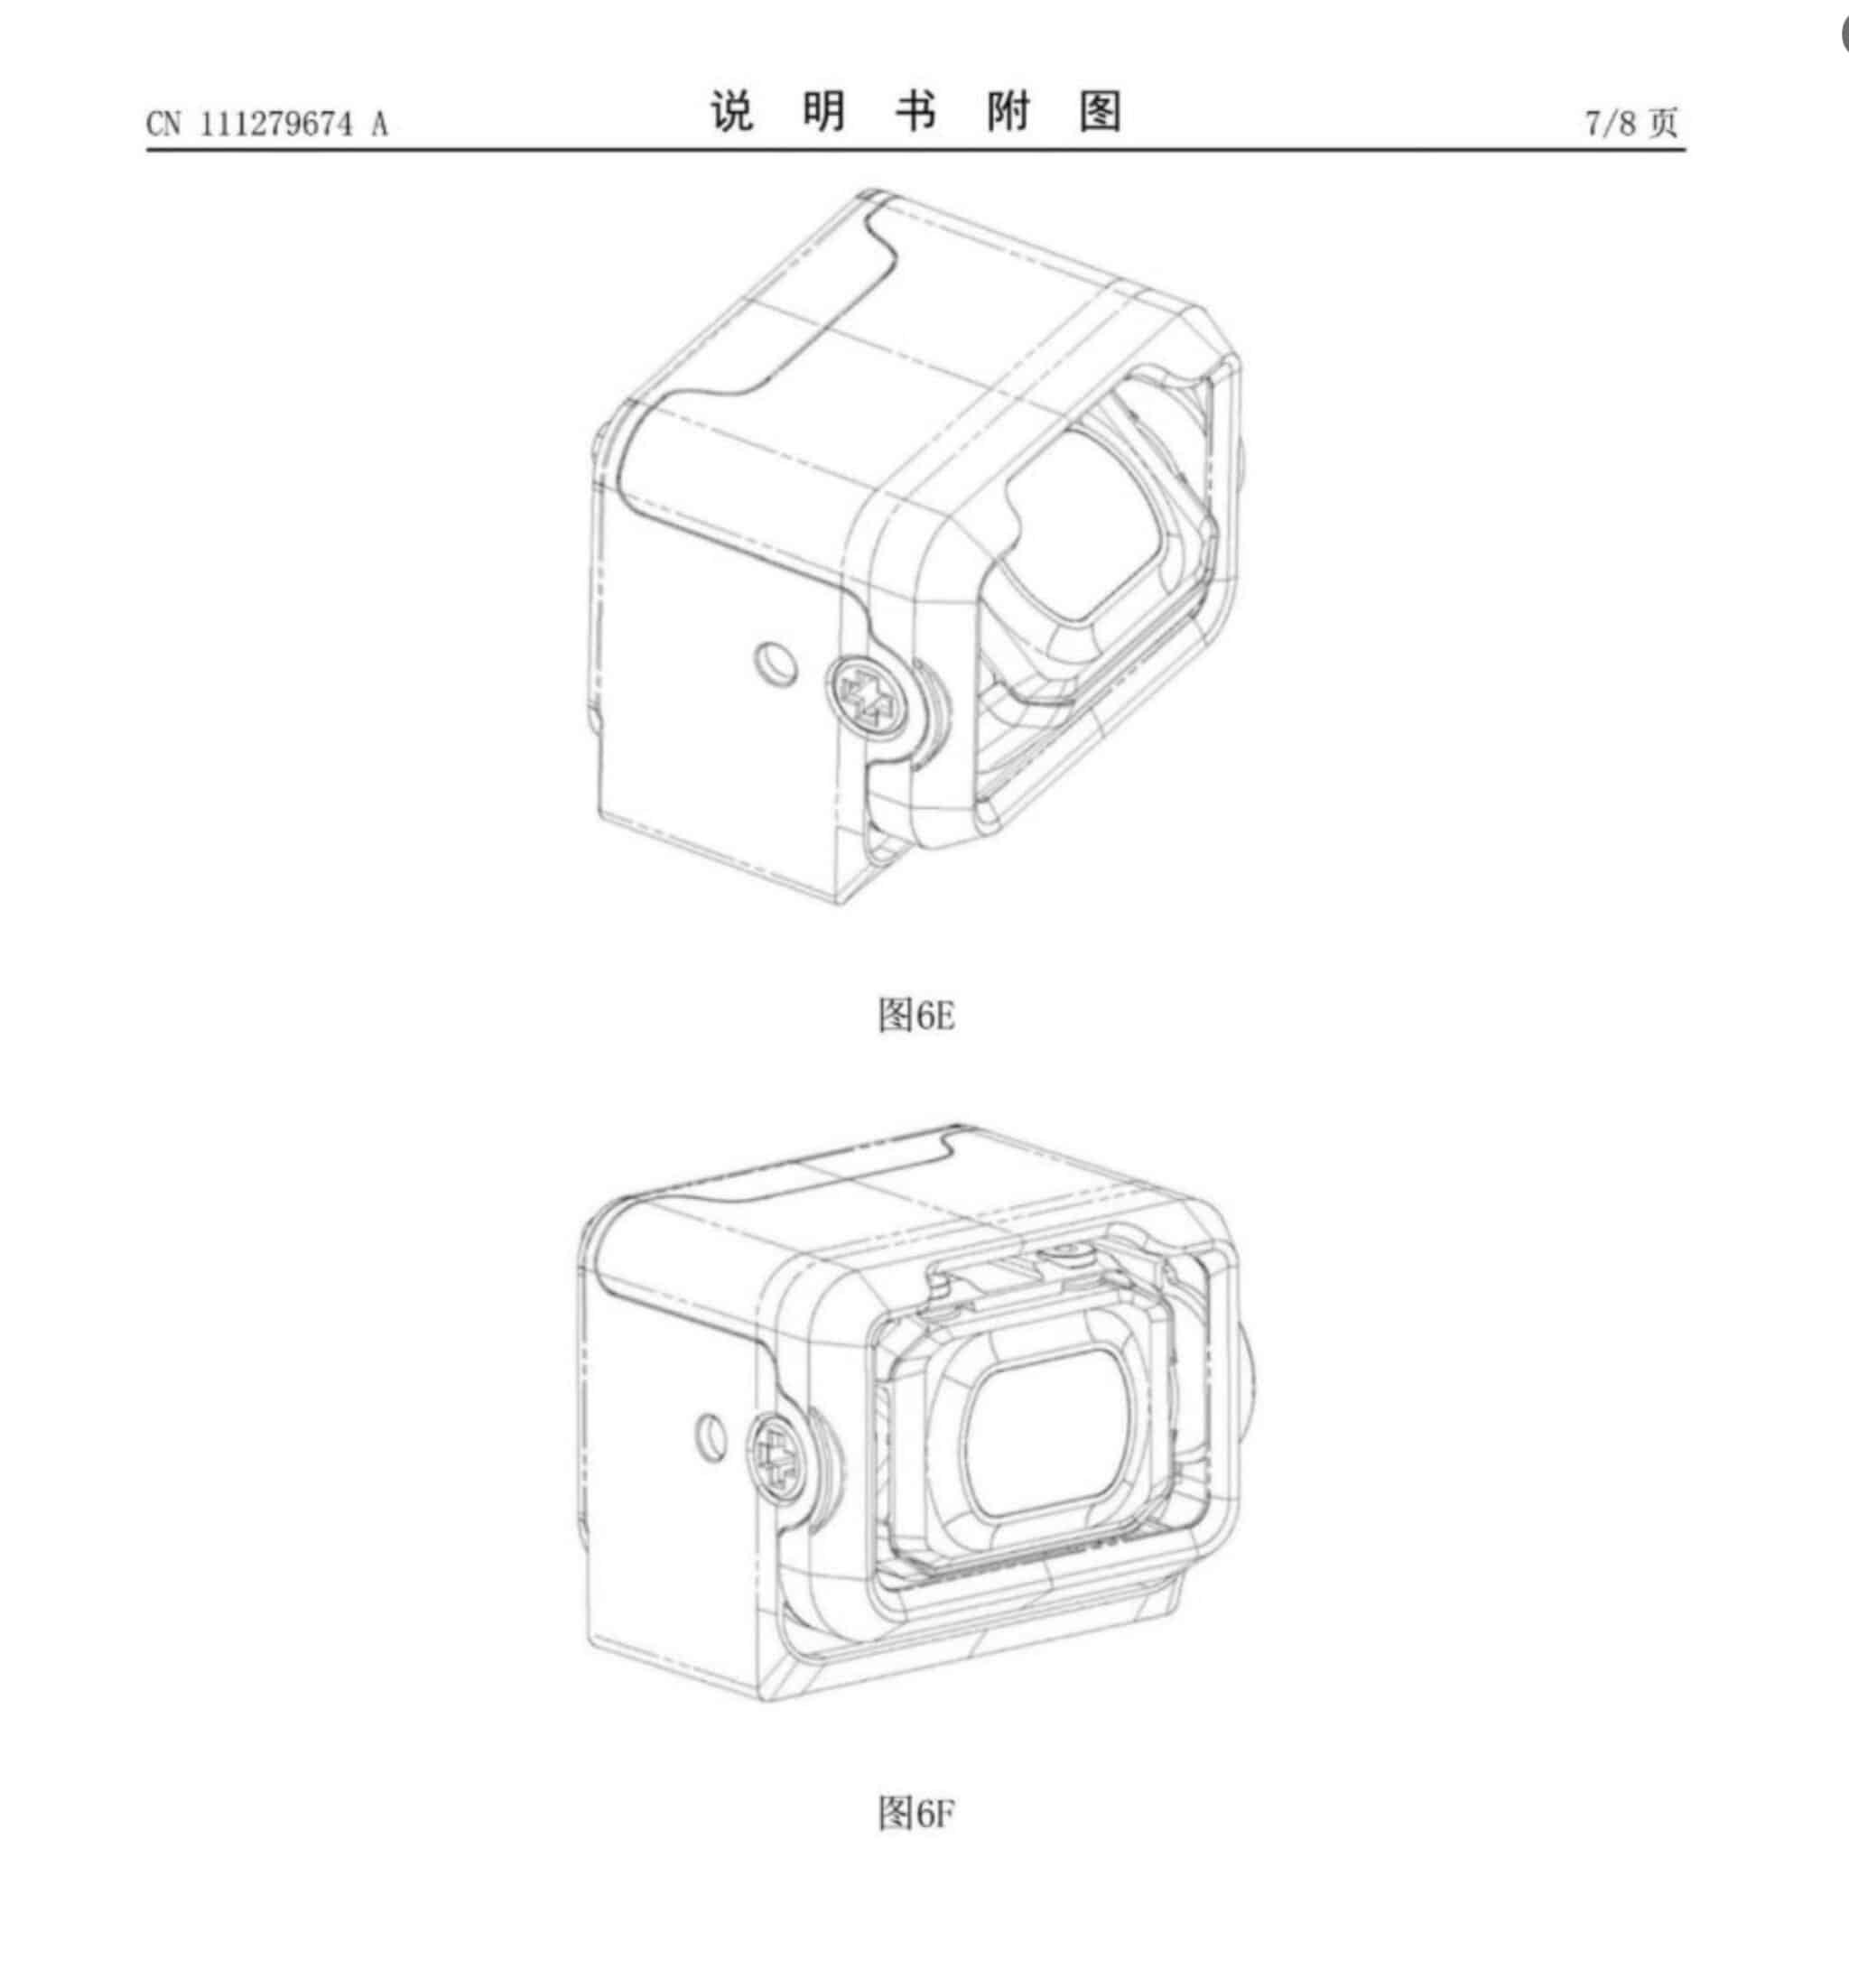 DJI FPV Camera patent drawings